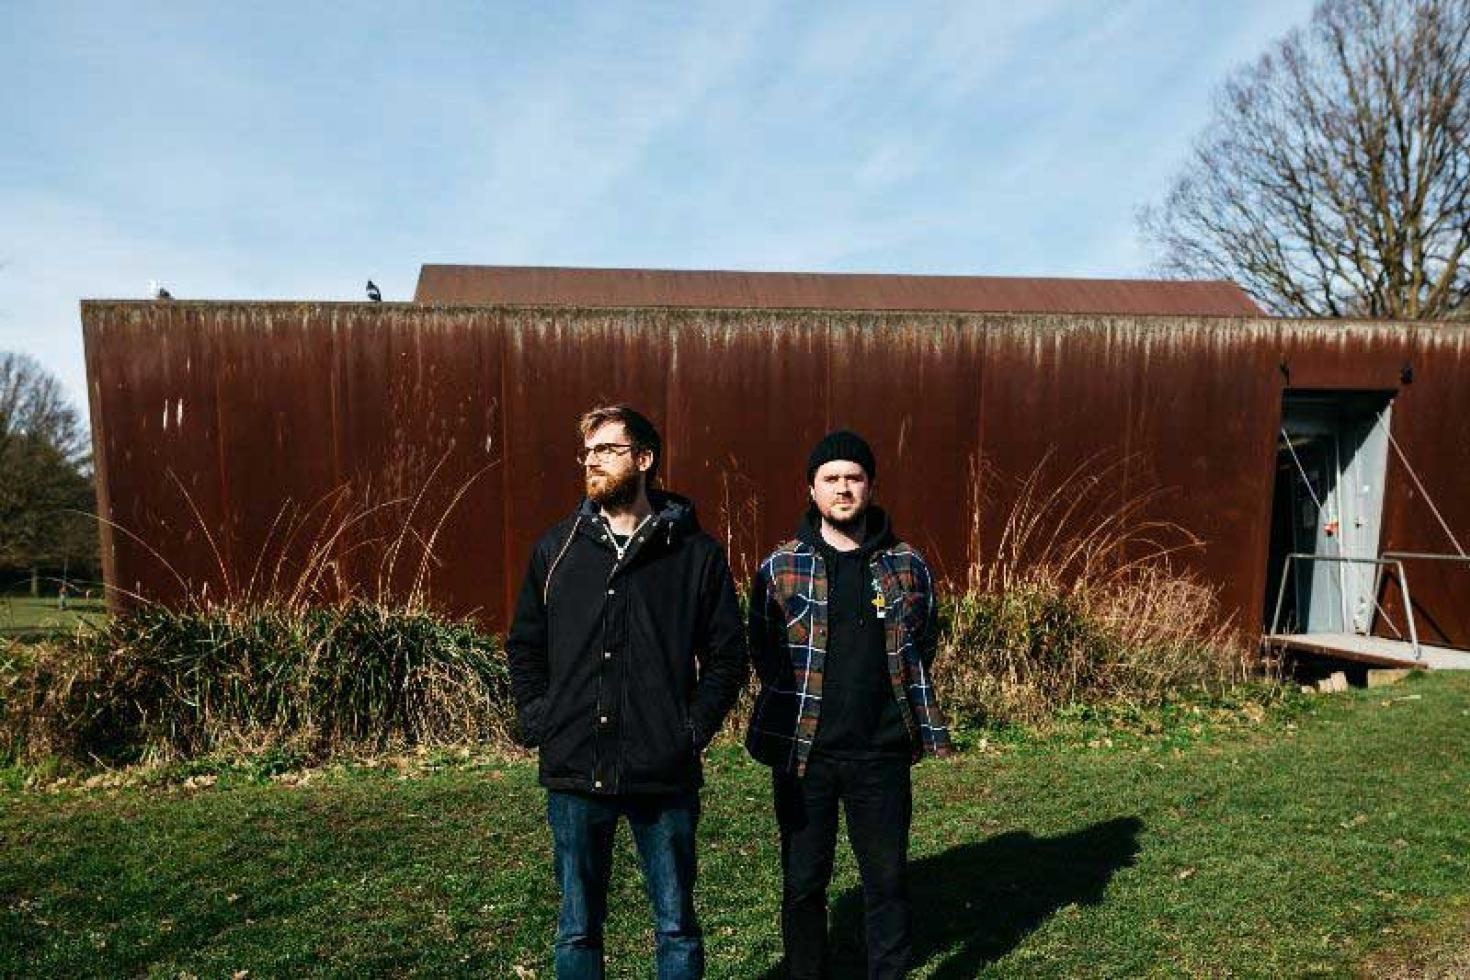 London duo JOHN release new single 'Stadium Of No'